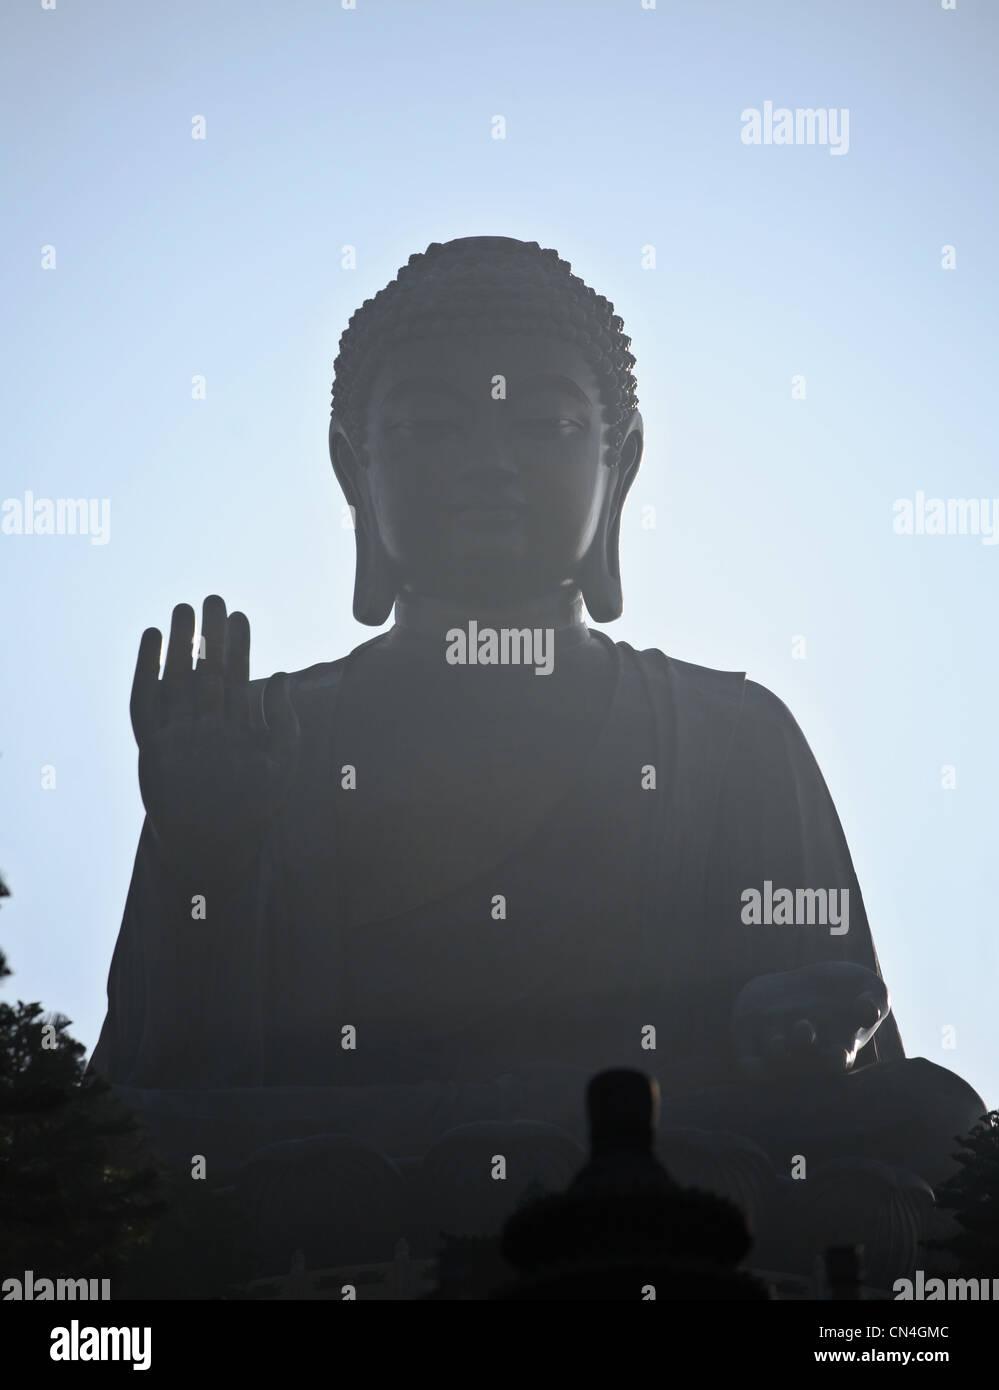 Big Buddha, Hong Kong, Lantau Island - Stock Image